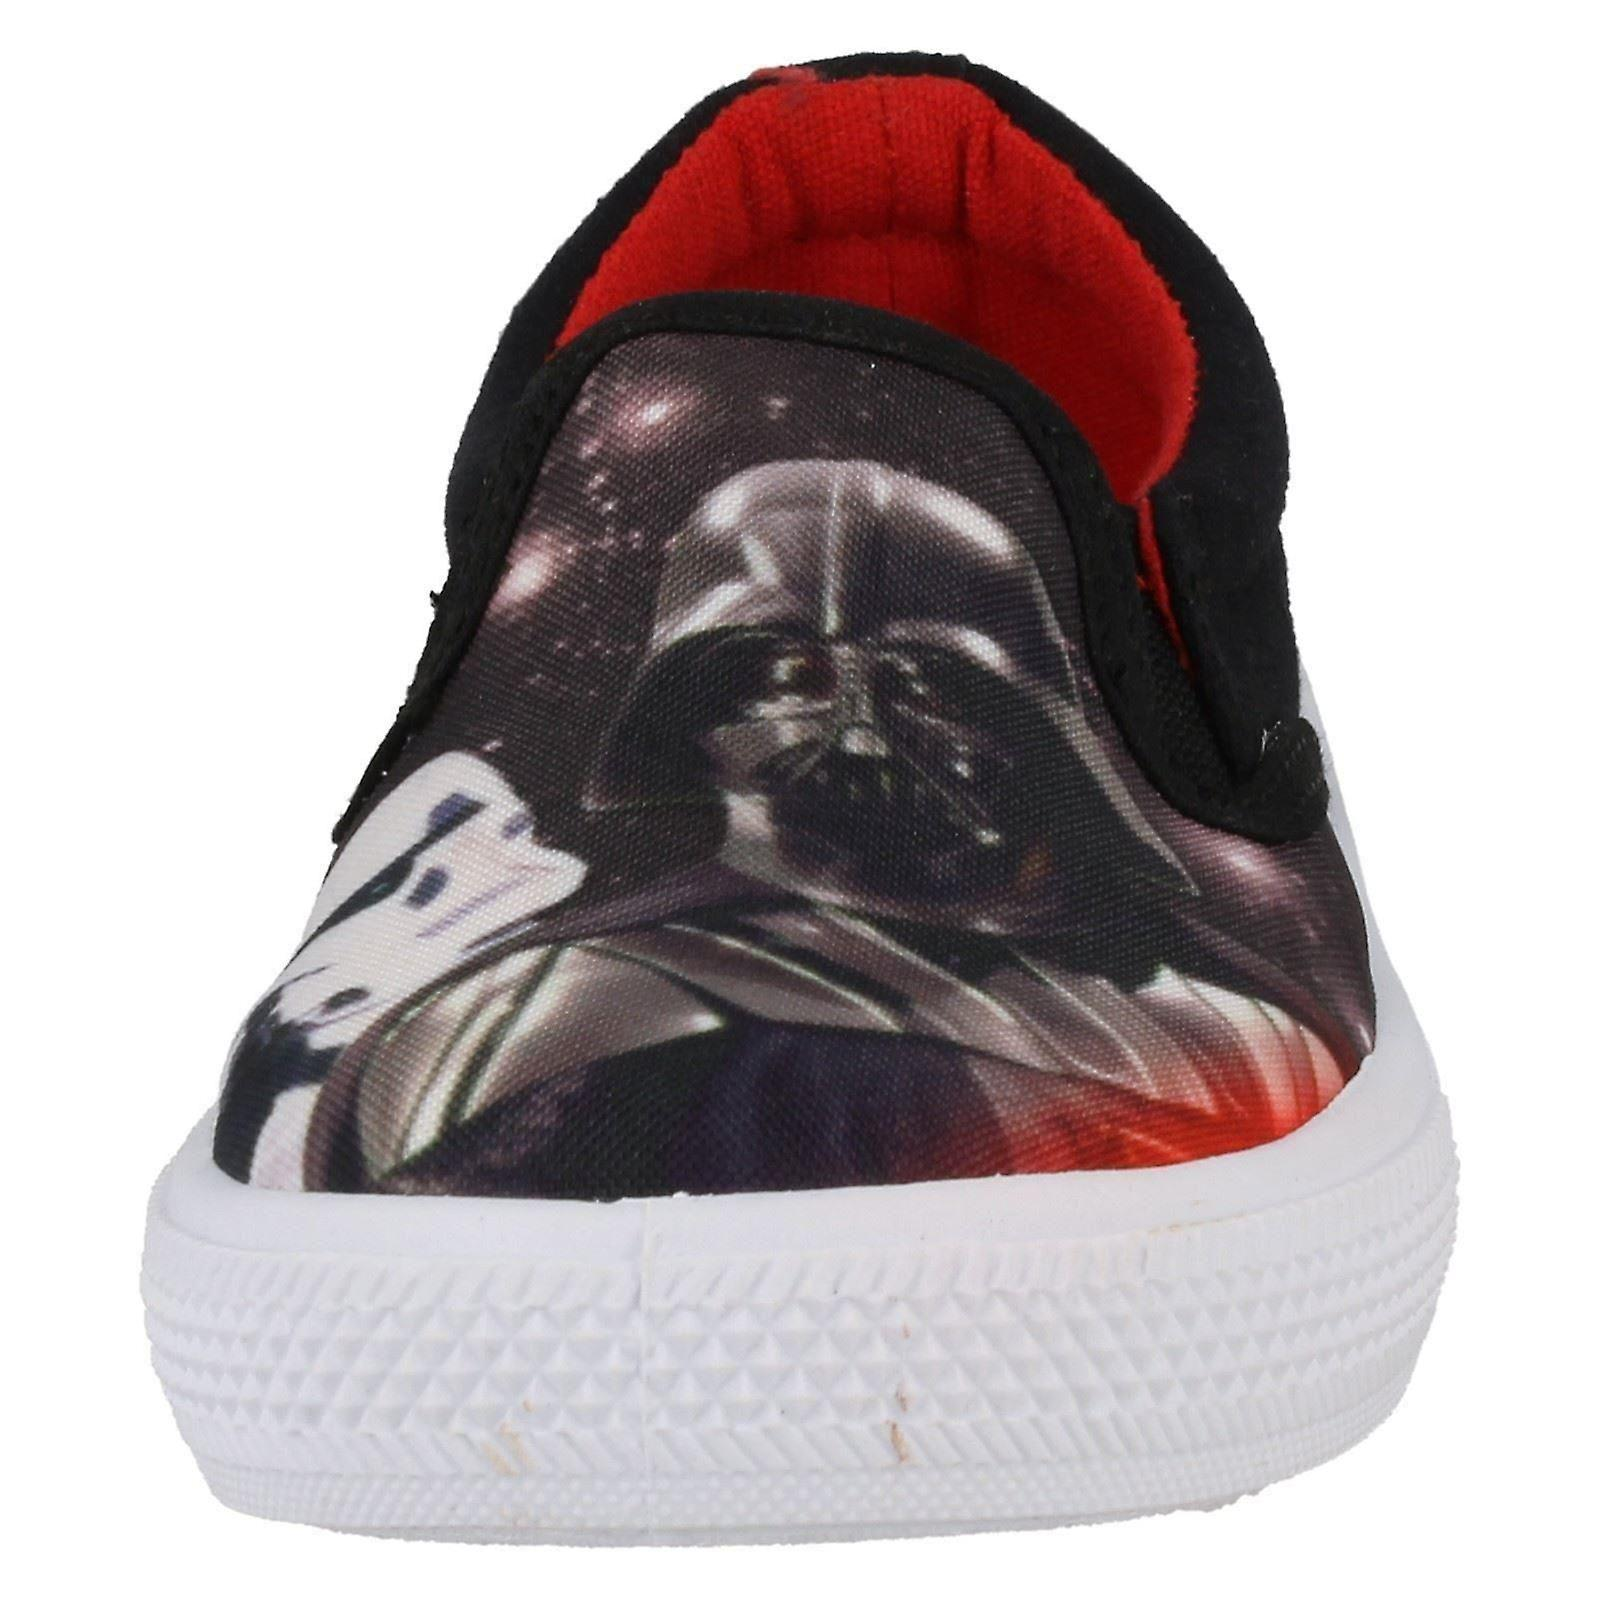 Garçons Star Wars Fairview Slip On Canvas Chaussures